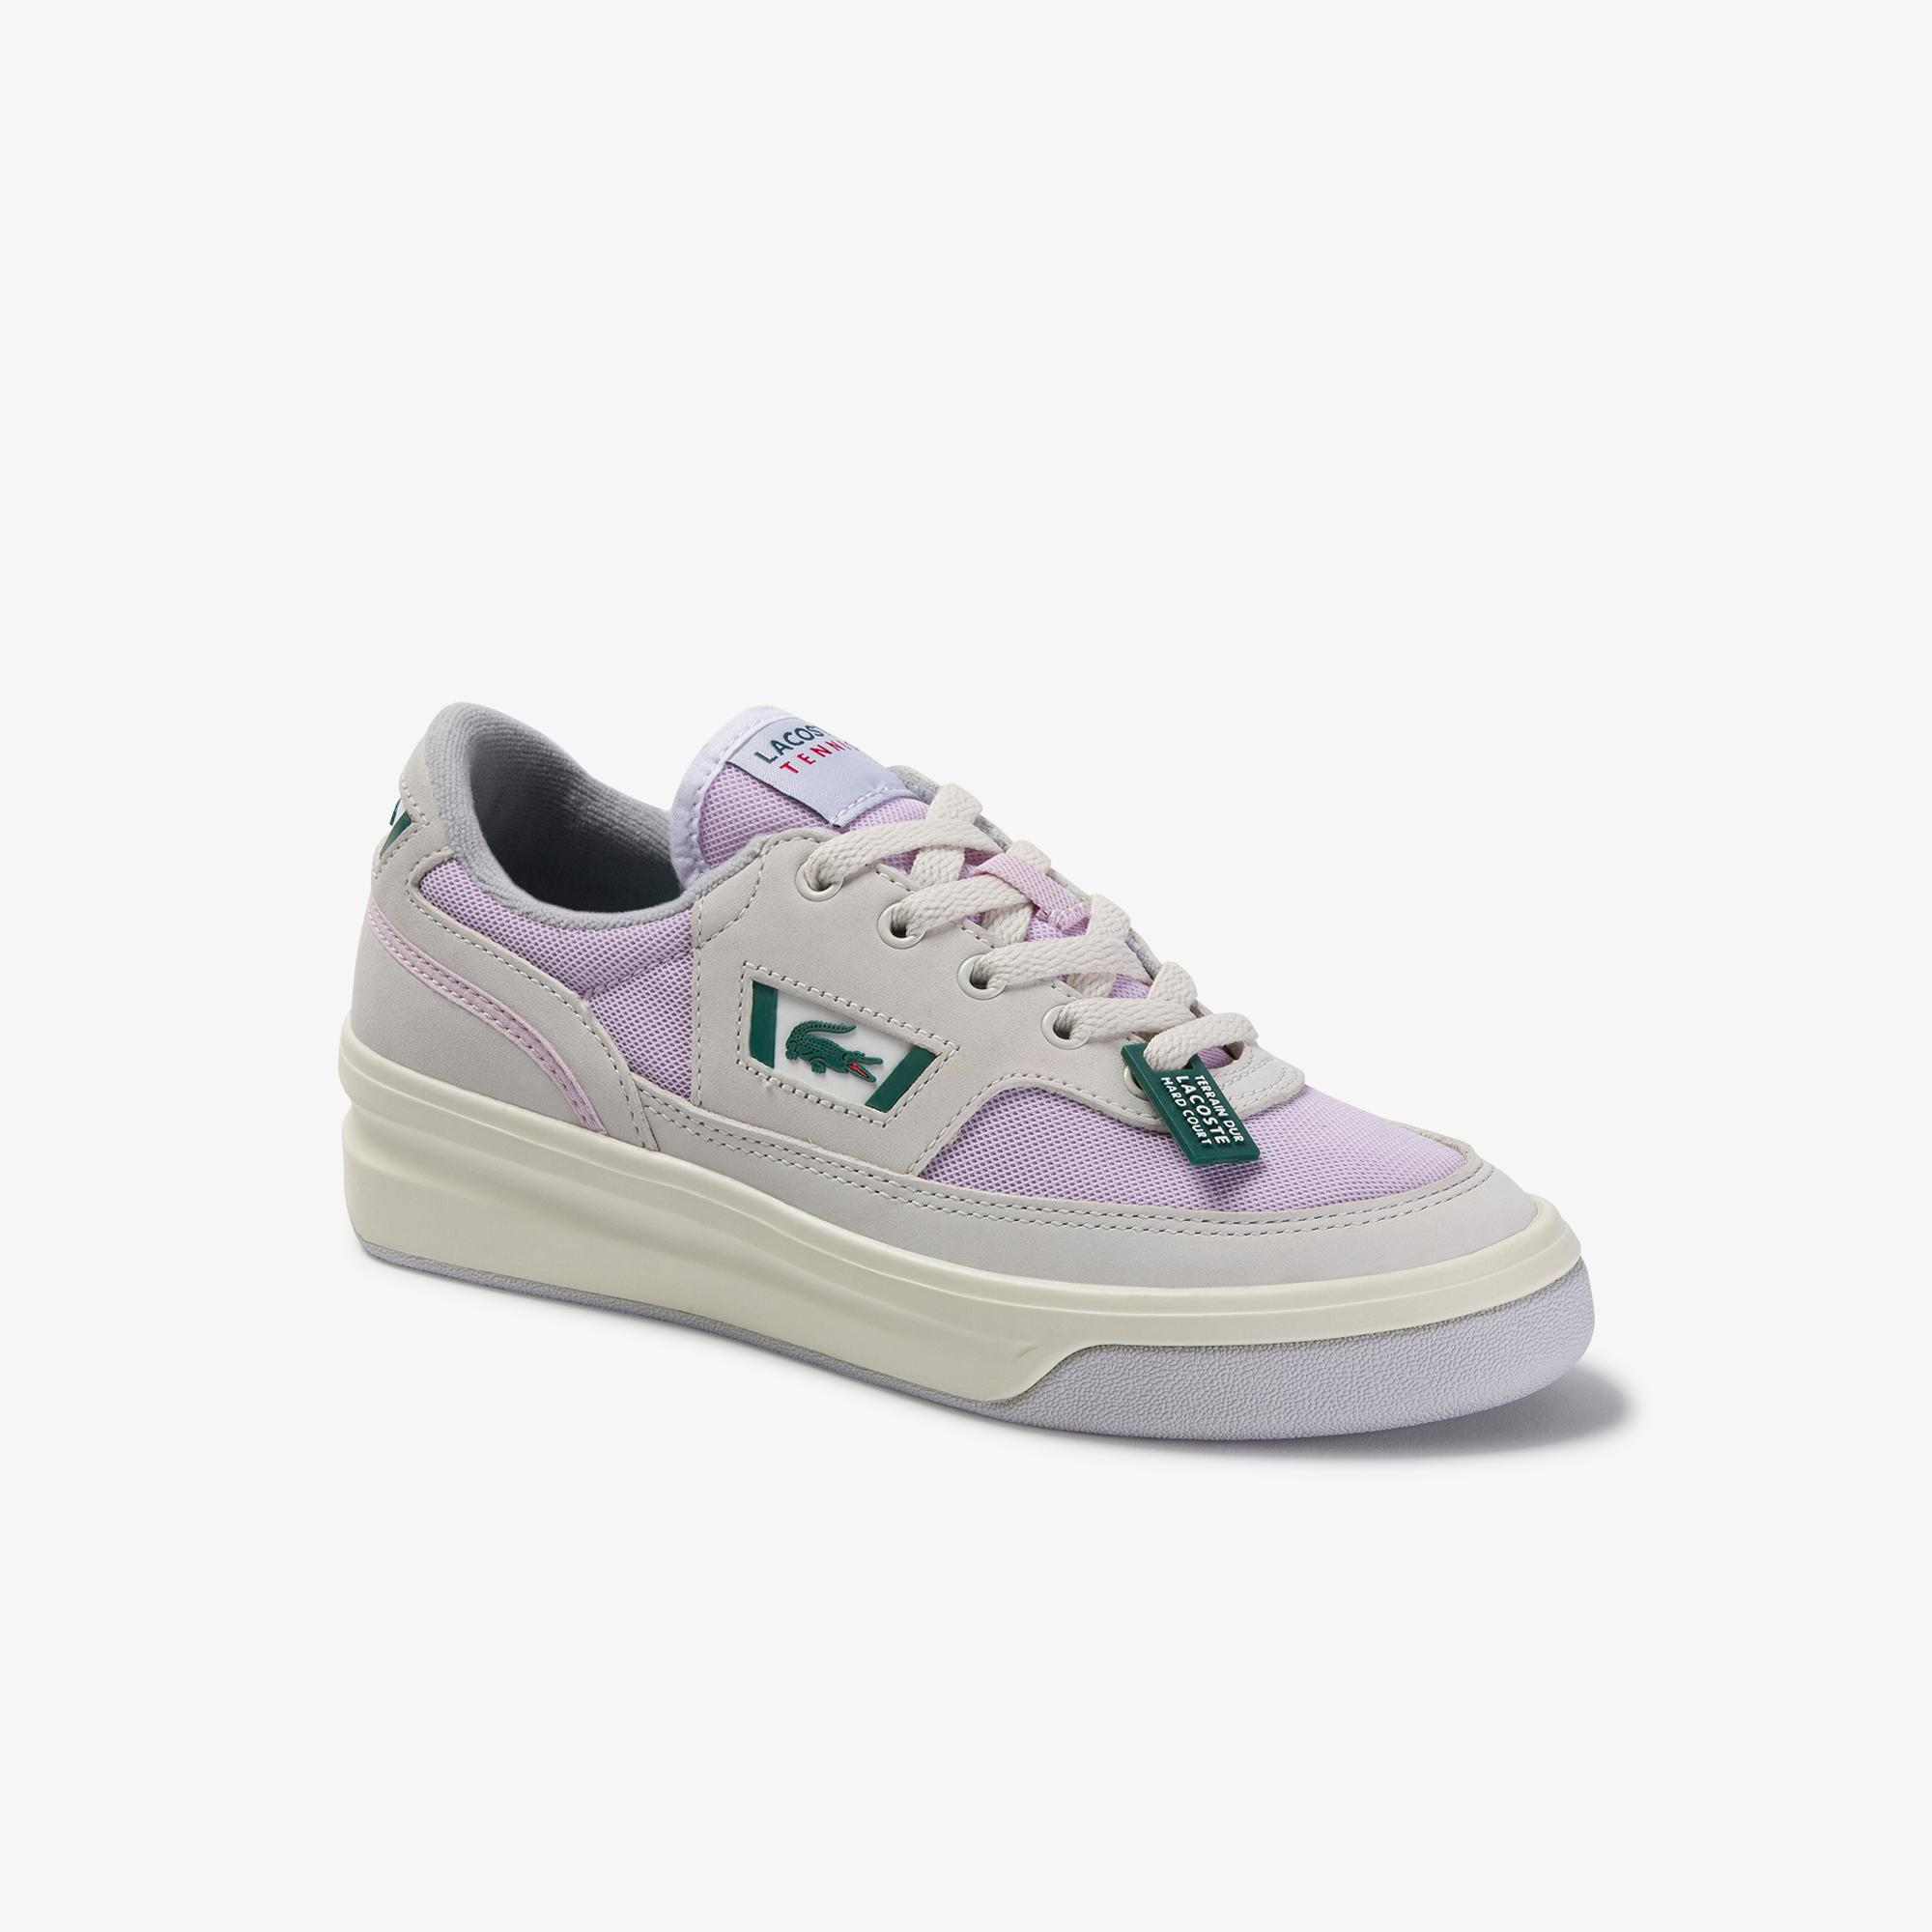 Lacoste кросівки жіночі G80